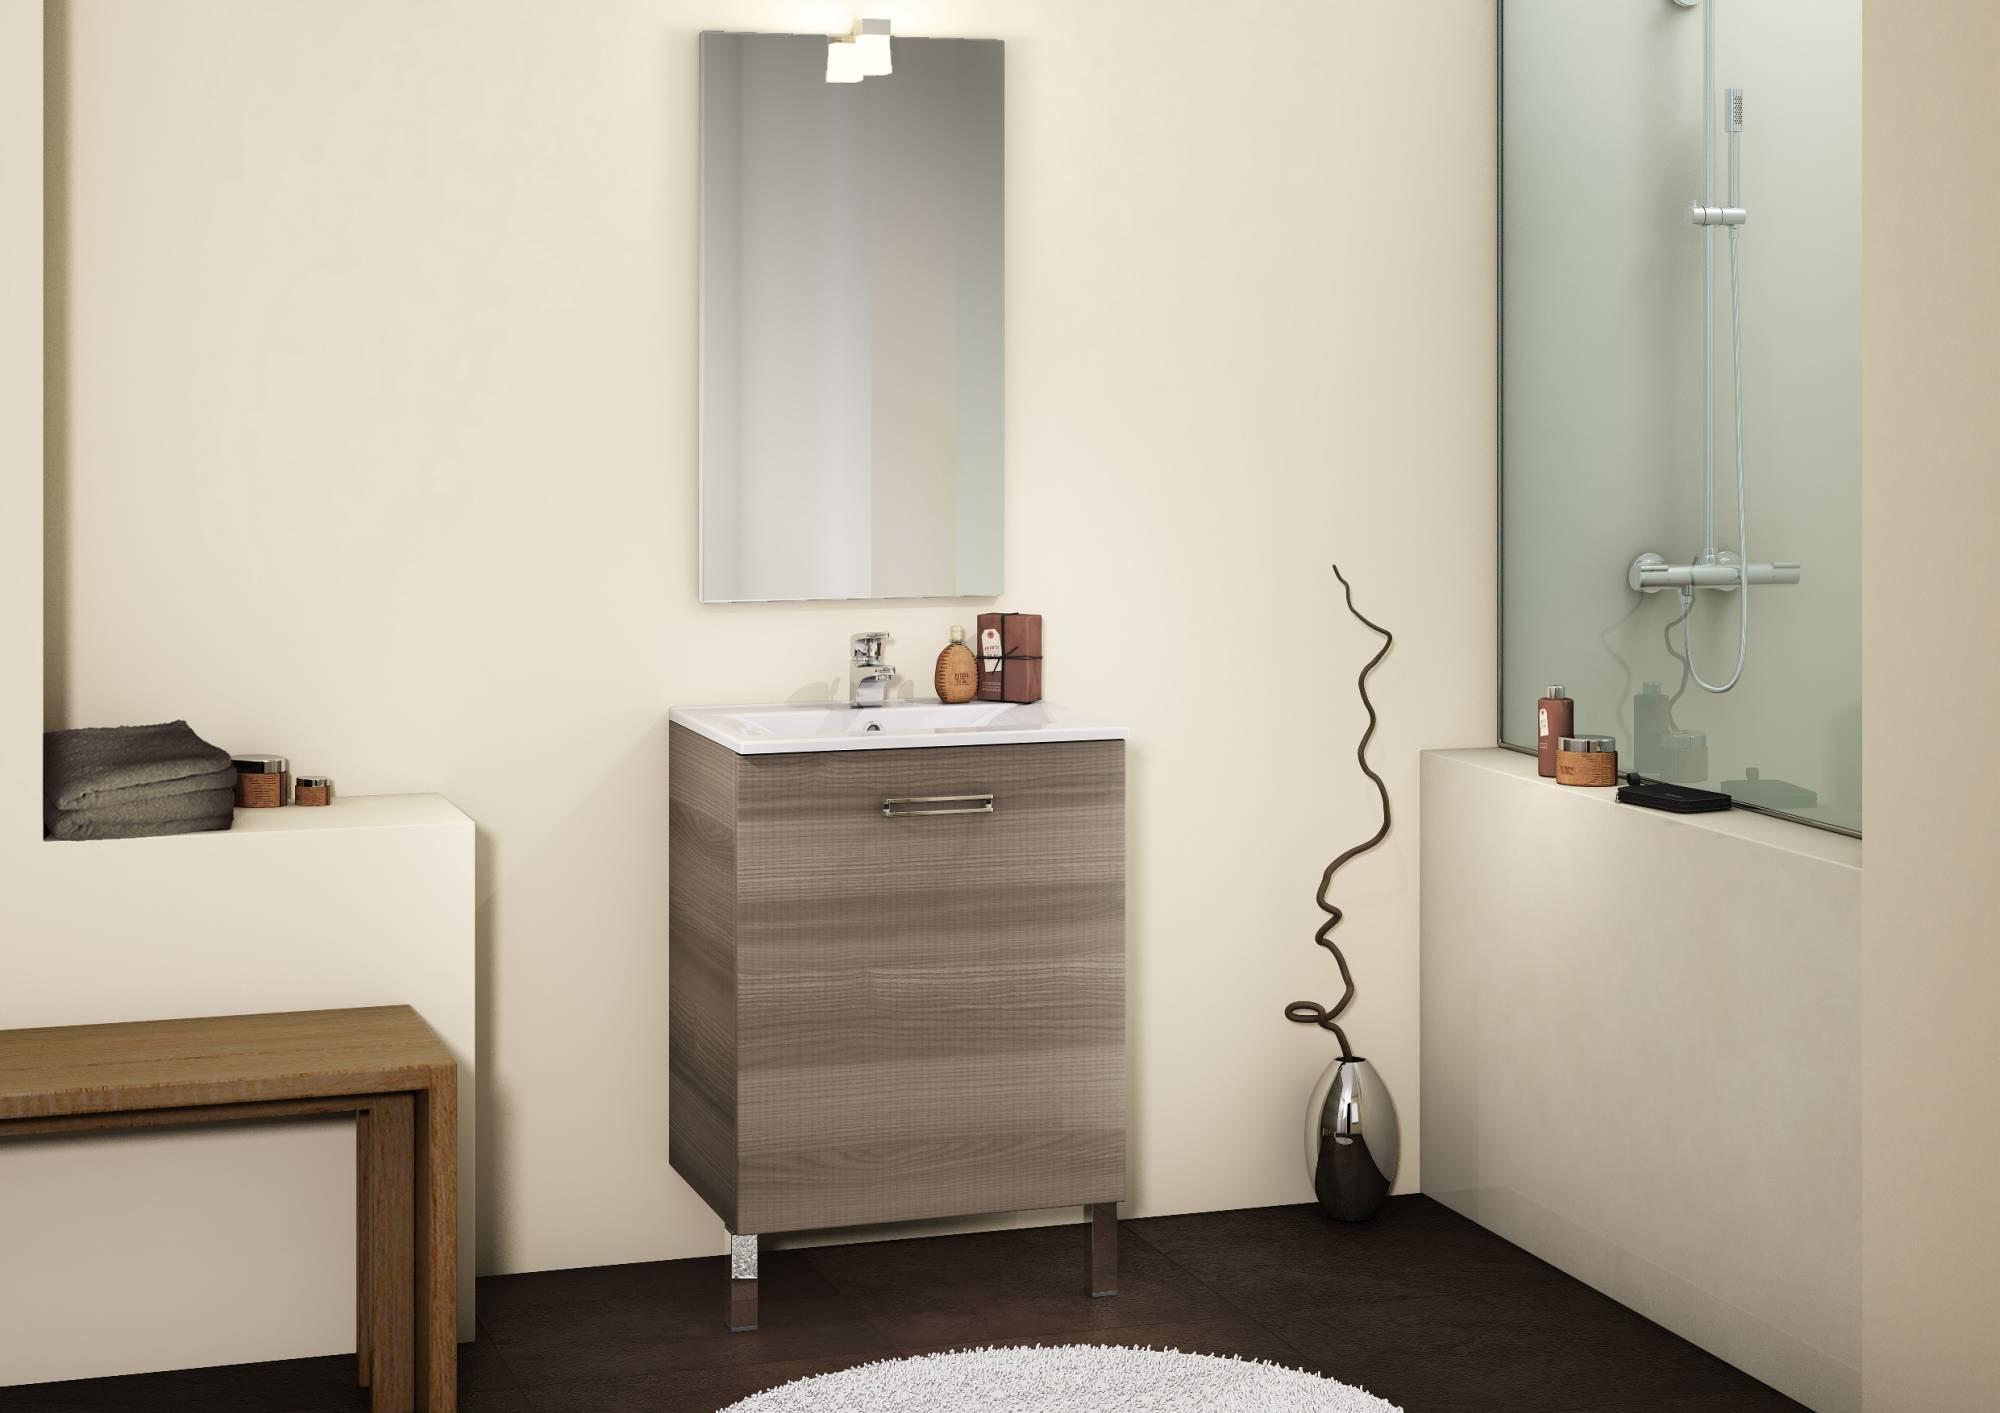 Meuble Pour Salle De Bains CHANGO Eguilles Carrelage - Meuble salle de bain sur pieds